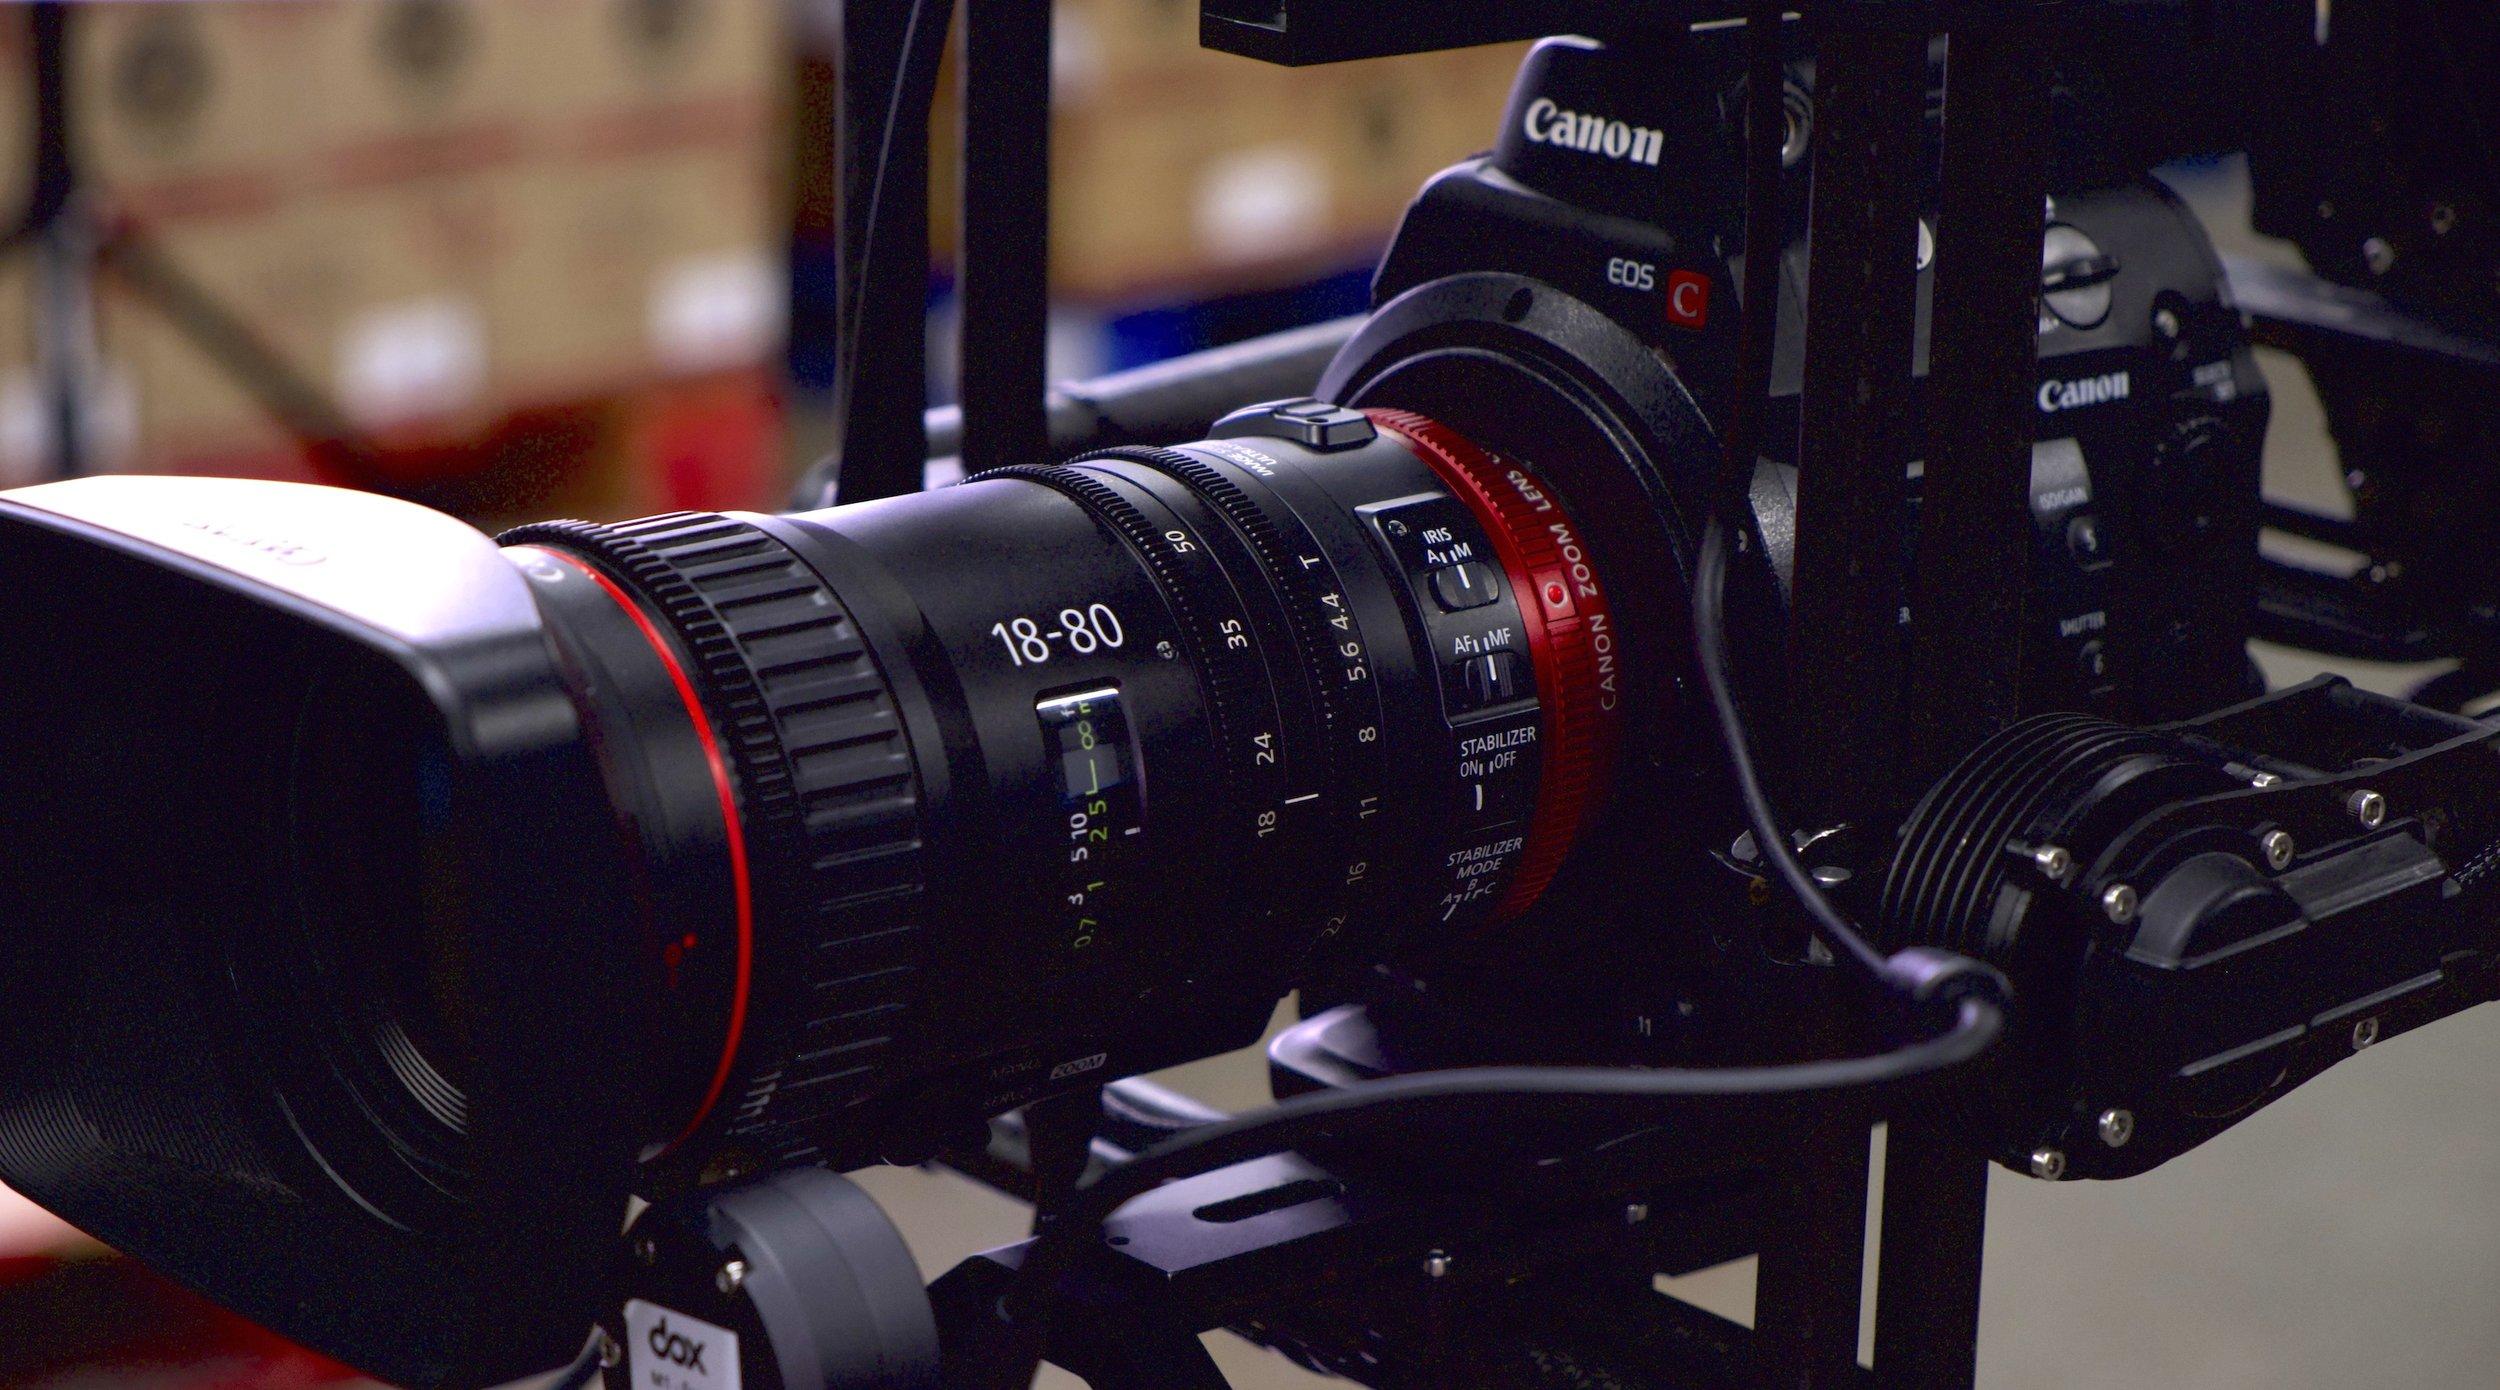 CAMERA STABILIZATION - MoVI + C300 Mark IICanon 18-80mm cine-servo zoomWireless FIZ controlArmor Man 2, Segway miniPRO